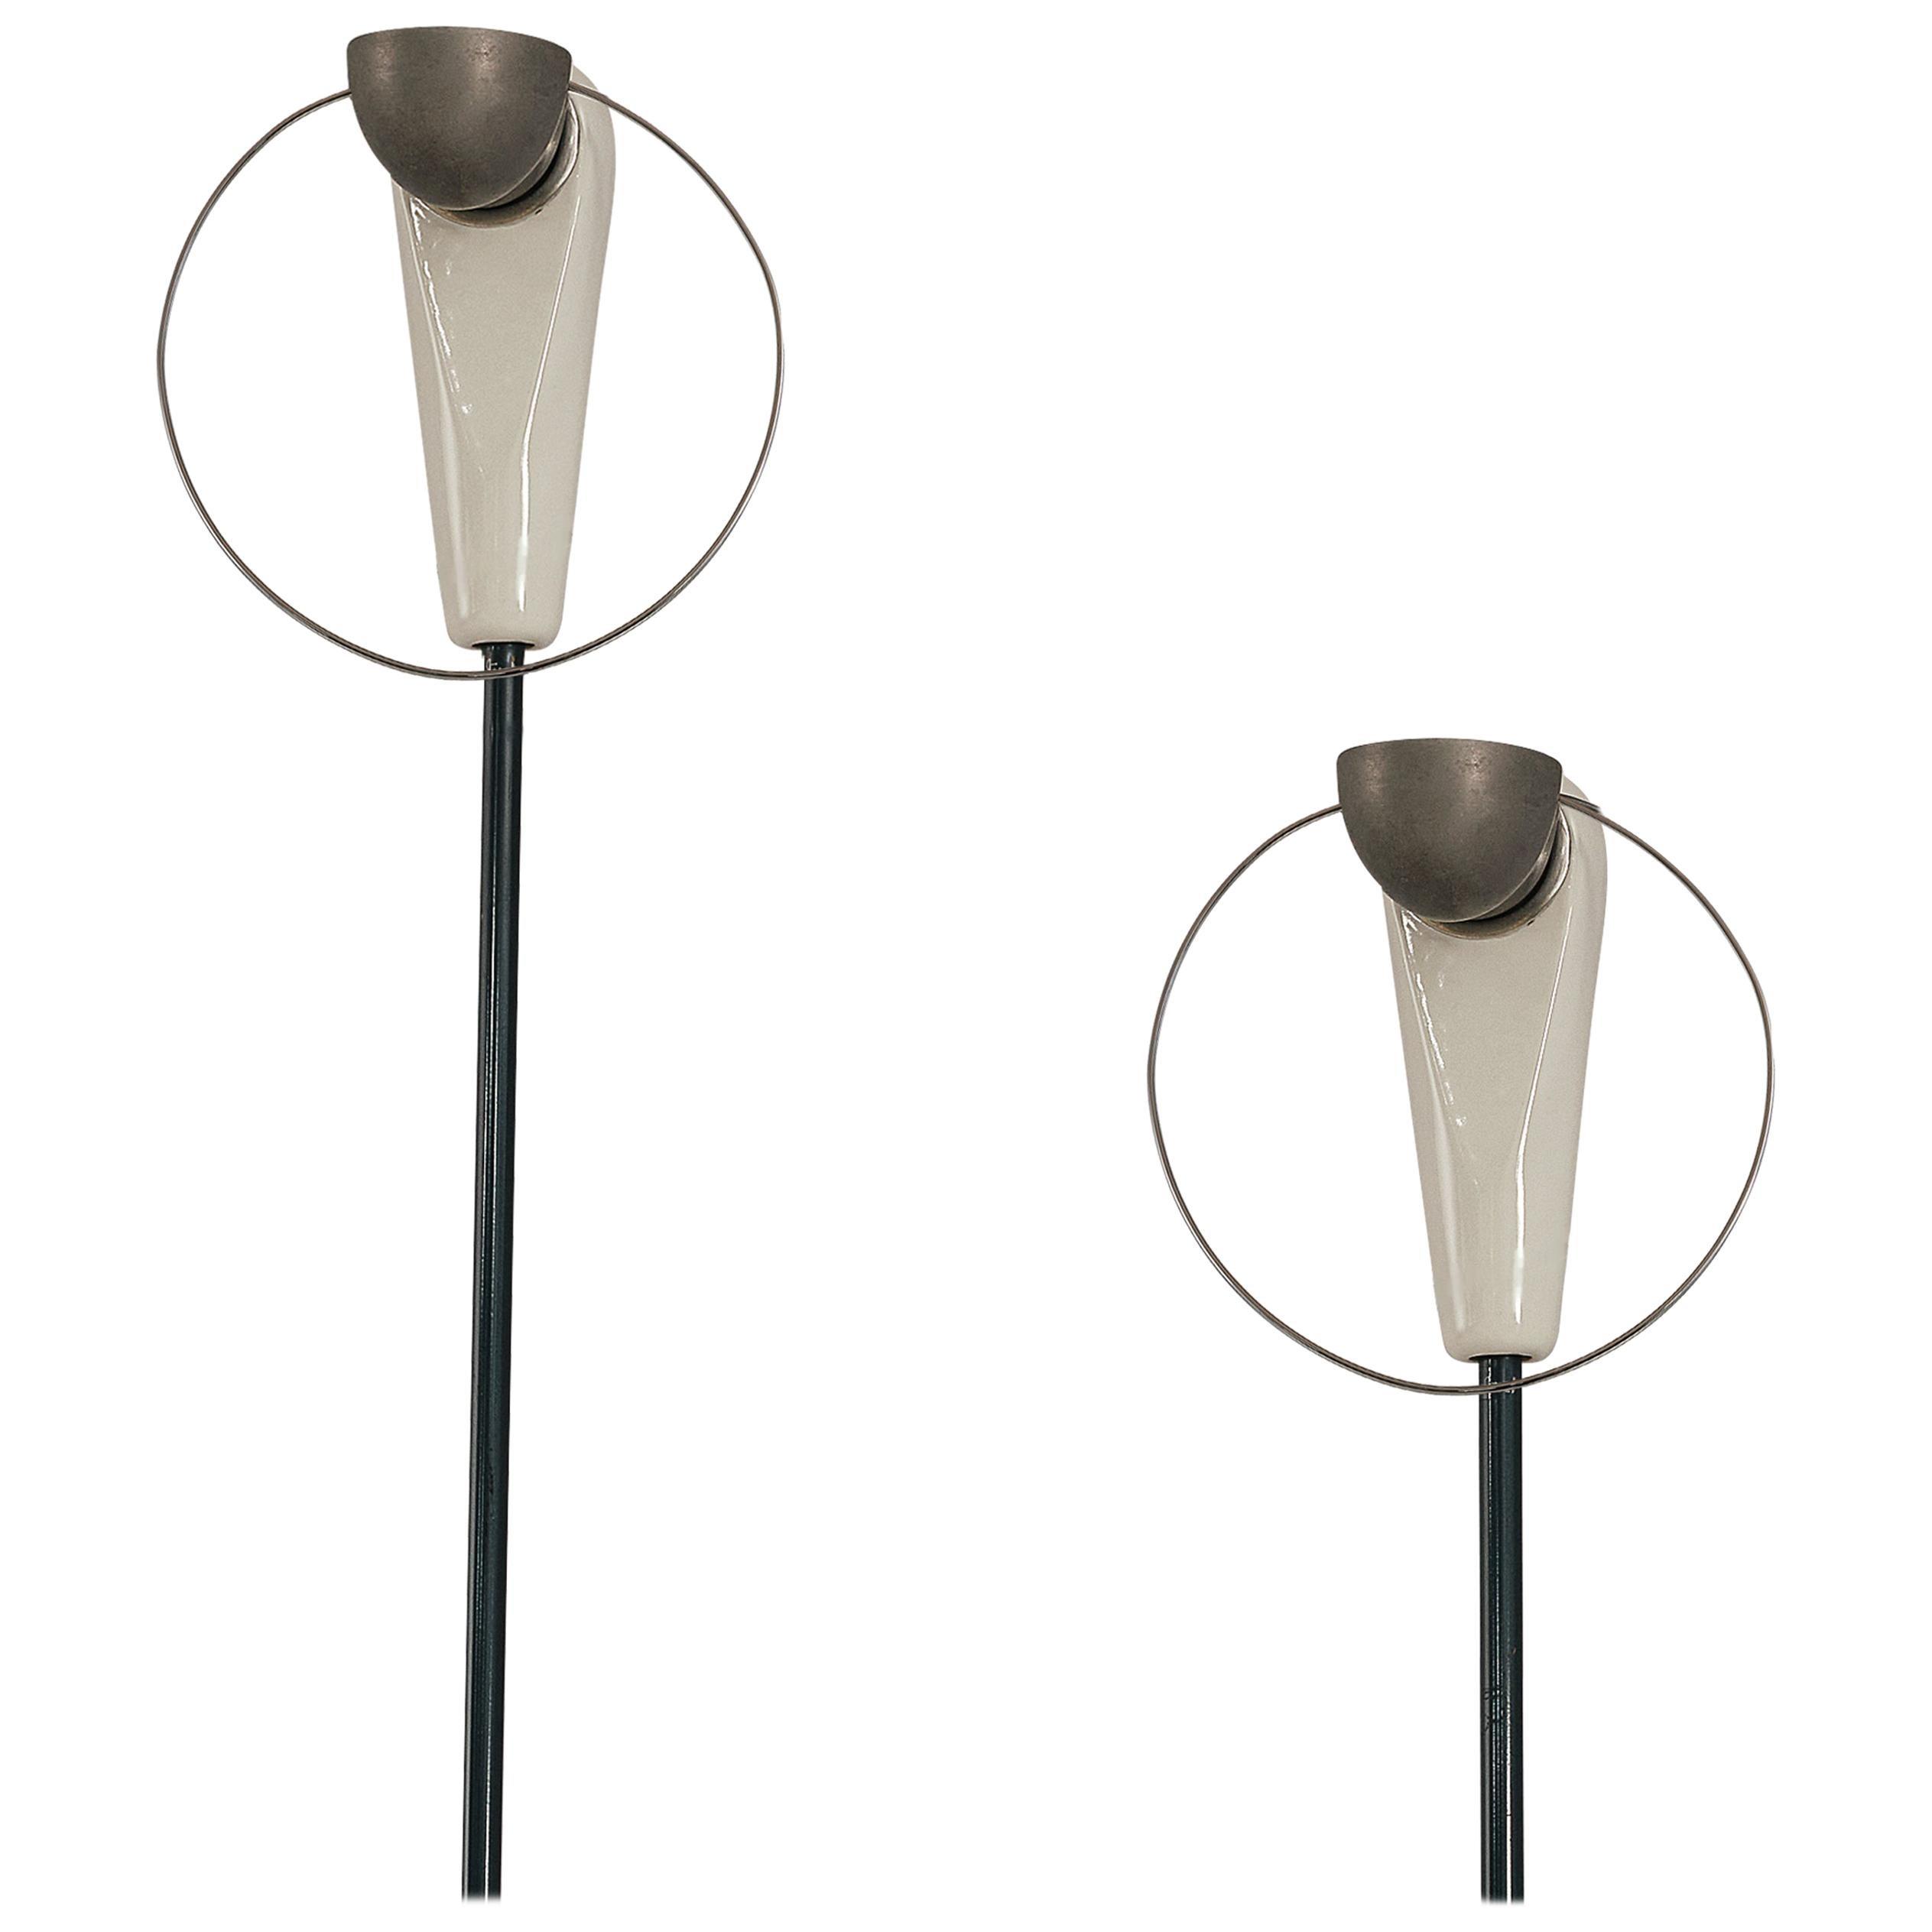 Achille Castiglioni for Flos Floor Lamps Model 'Bi Bip'